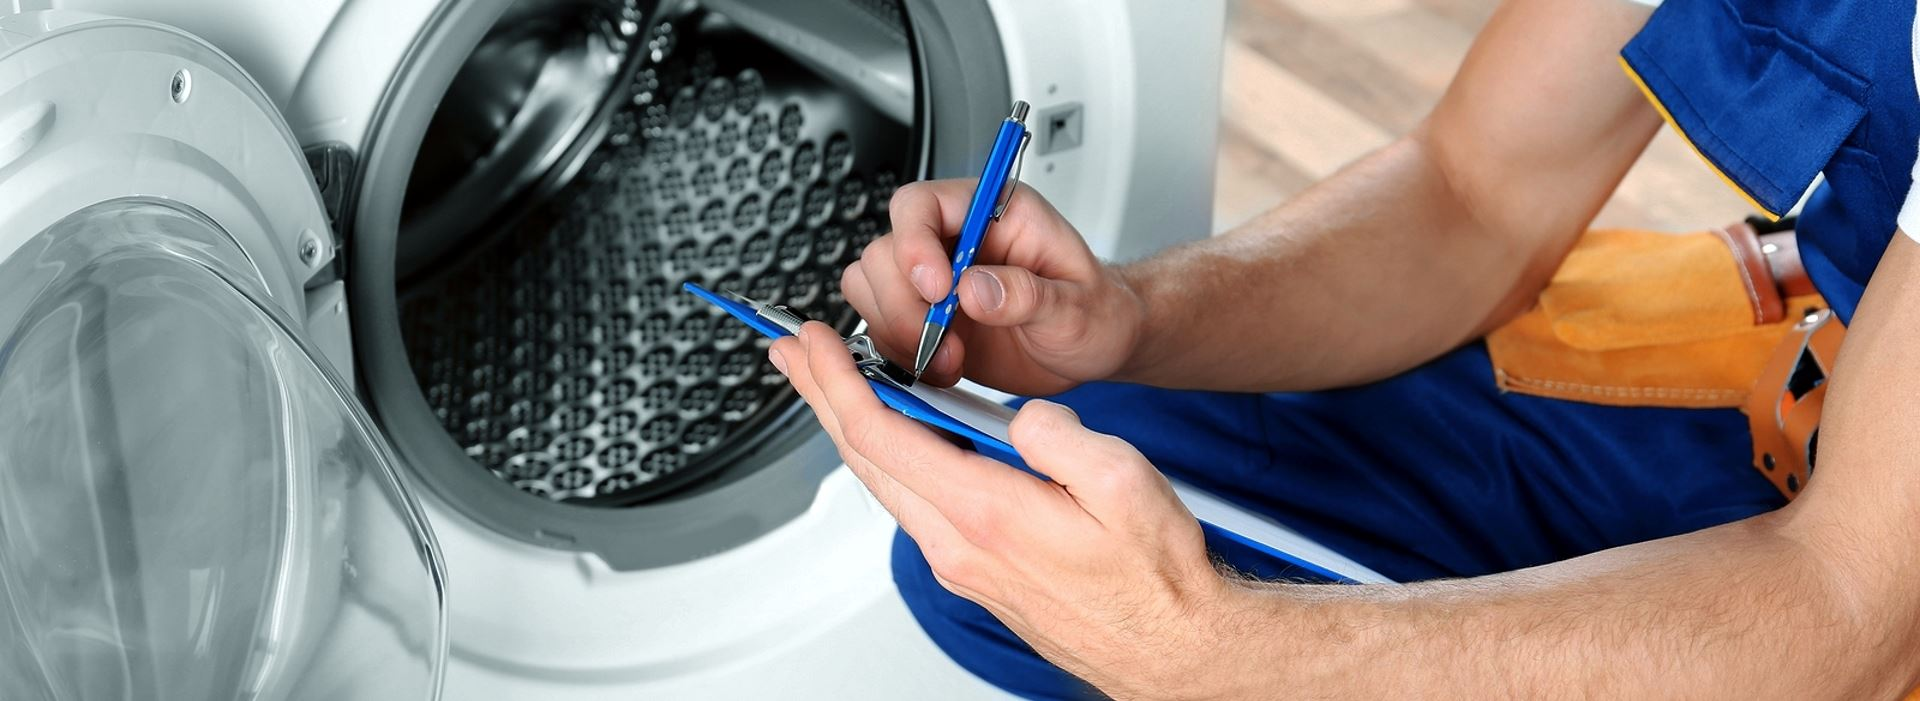 Appliance Repair In Los Angeles Socal Appliance Repair Pros